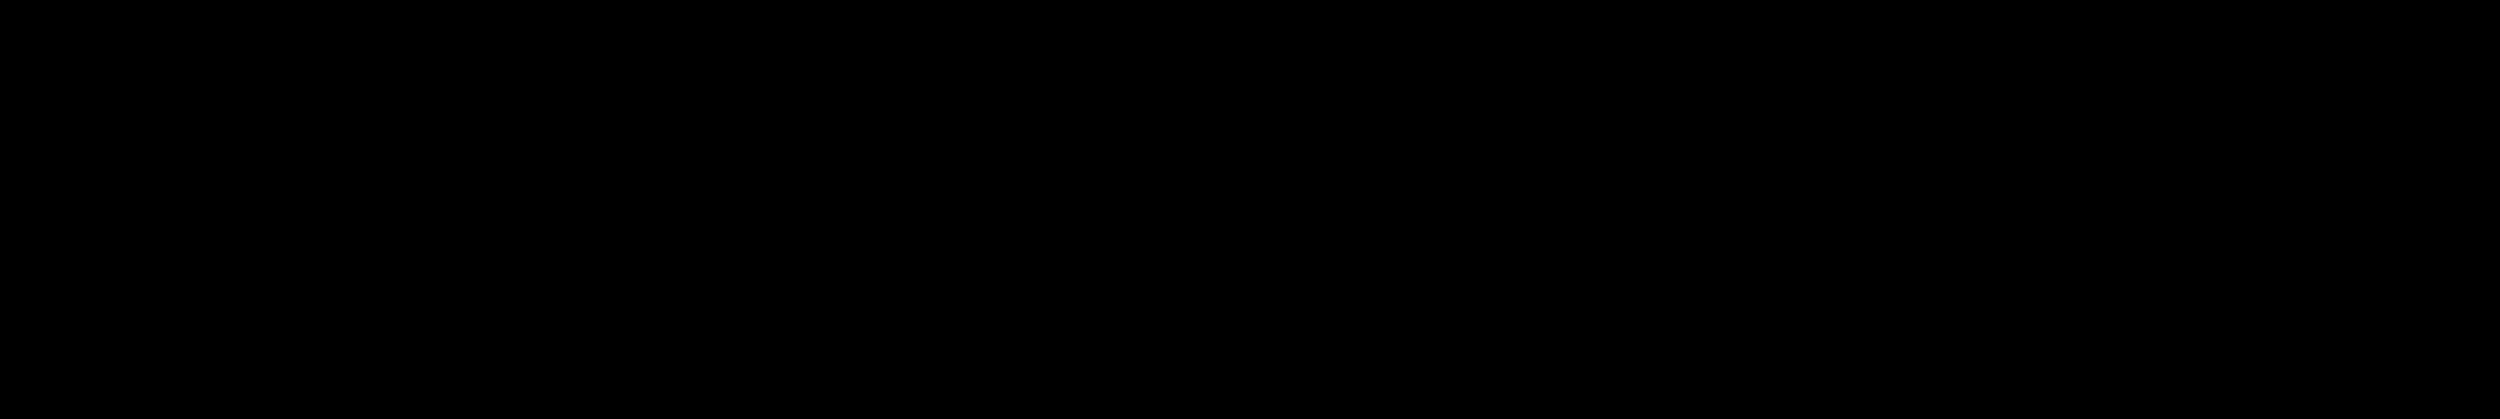 Playboy_logo_wordmark.png